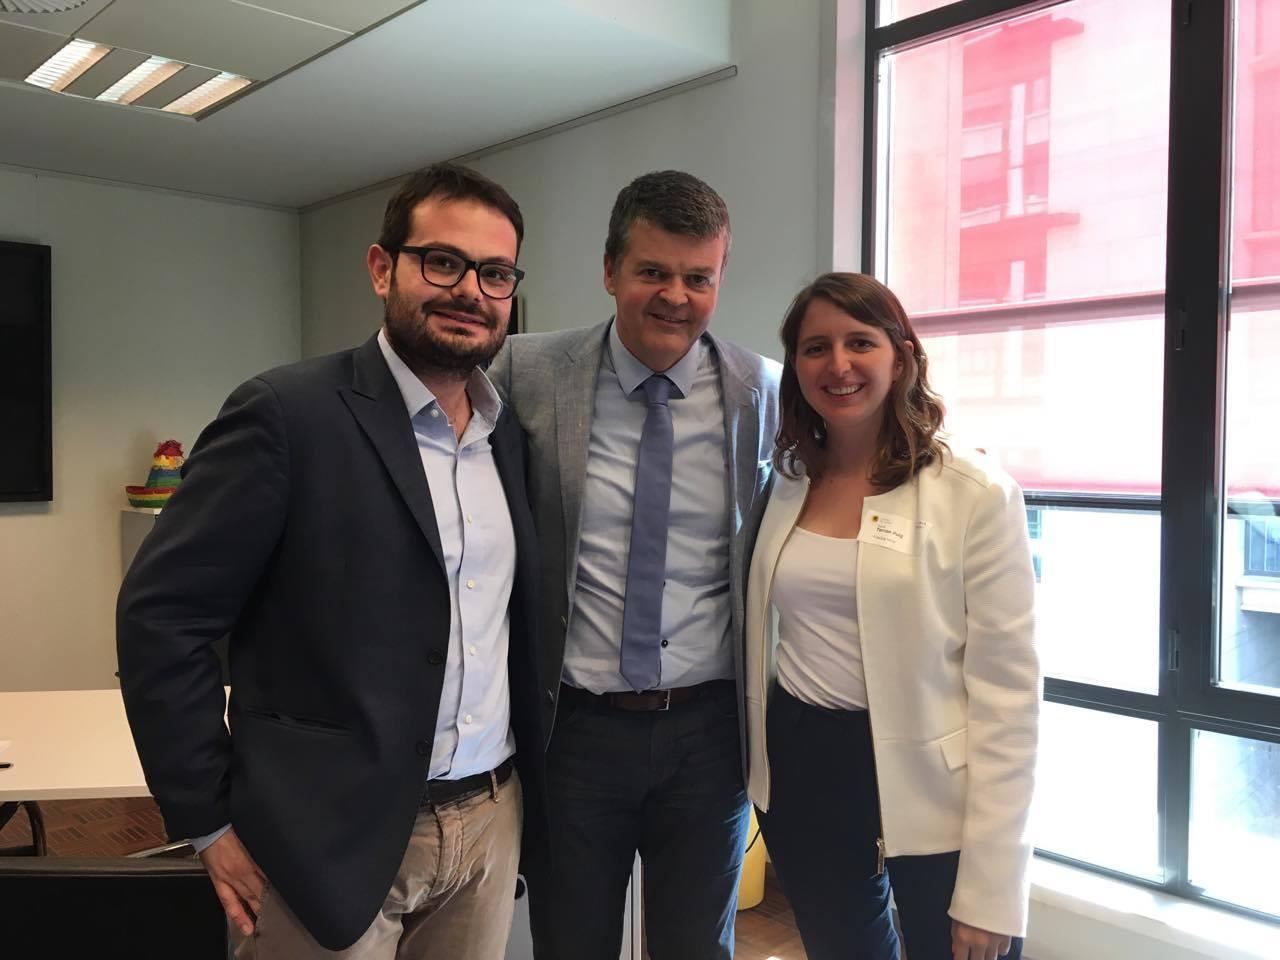 UNITEE's representatives with Bart Somers, mayor of Mechelen.